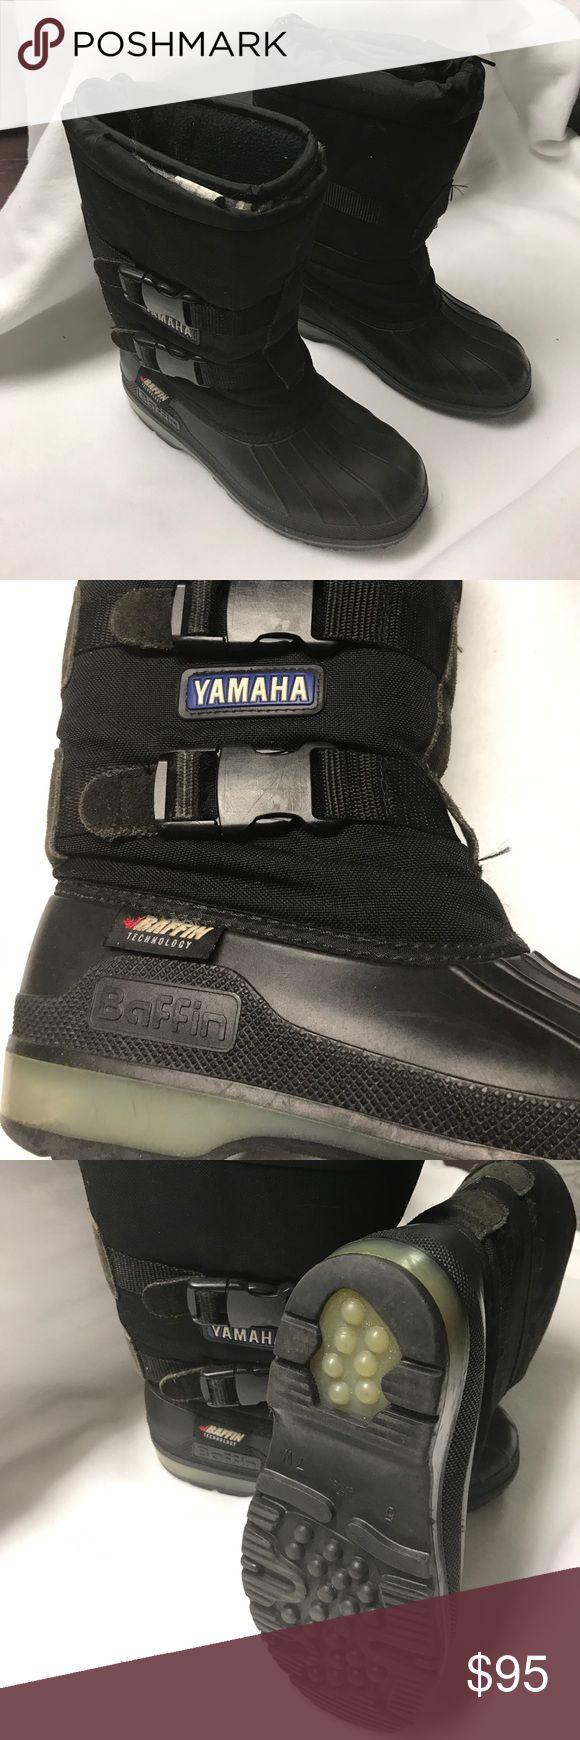 Baffin winter boots, black, size 7, euc. Baffin winter boots, black, women's size 7, euc Baffin Shoes Winter & Rain Boots